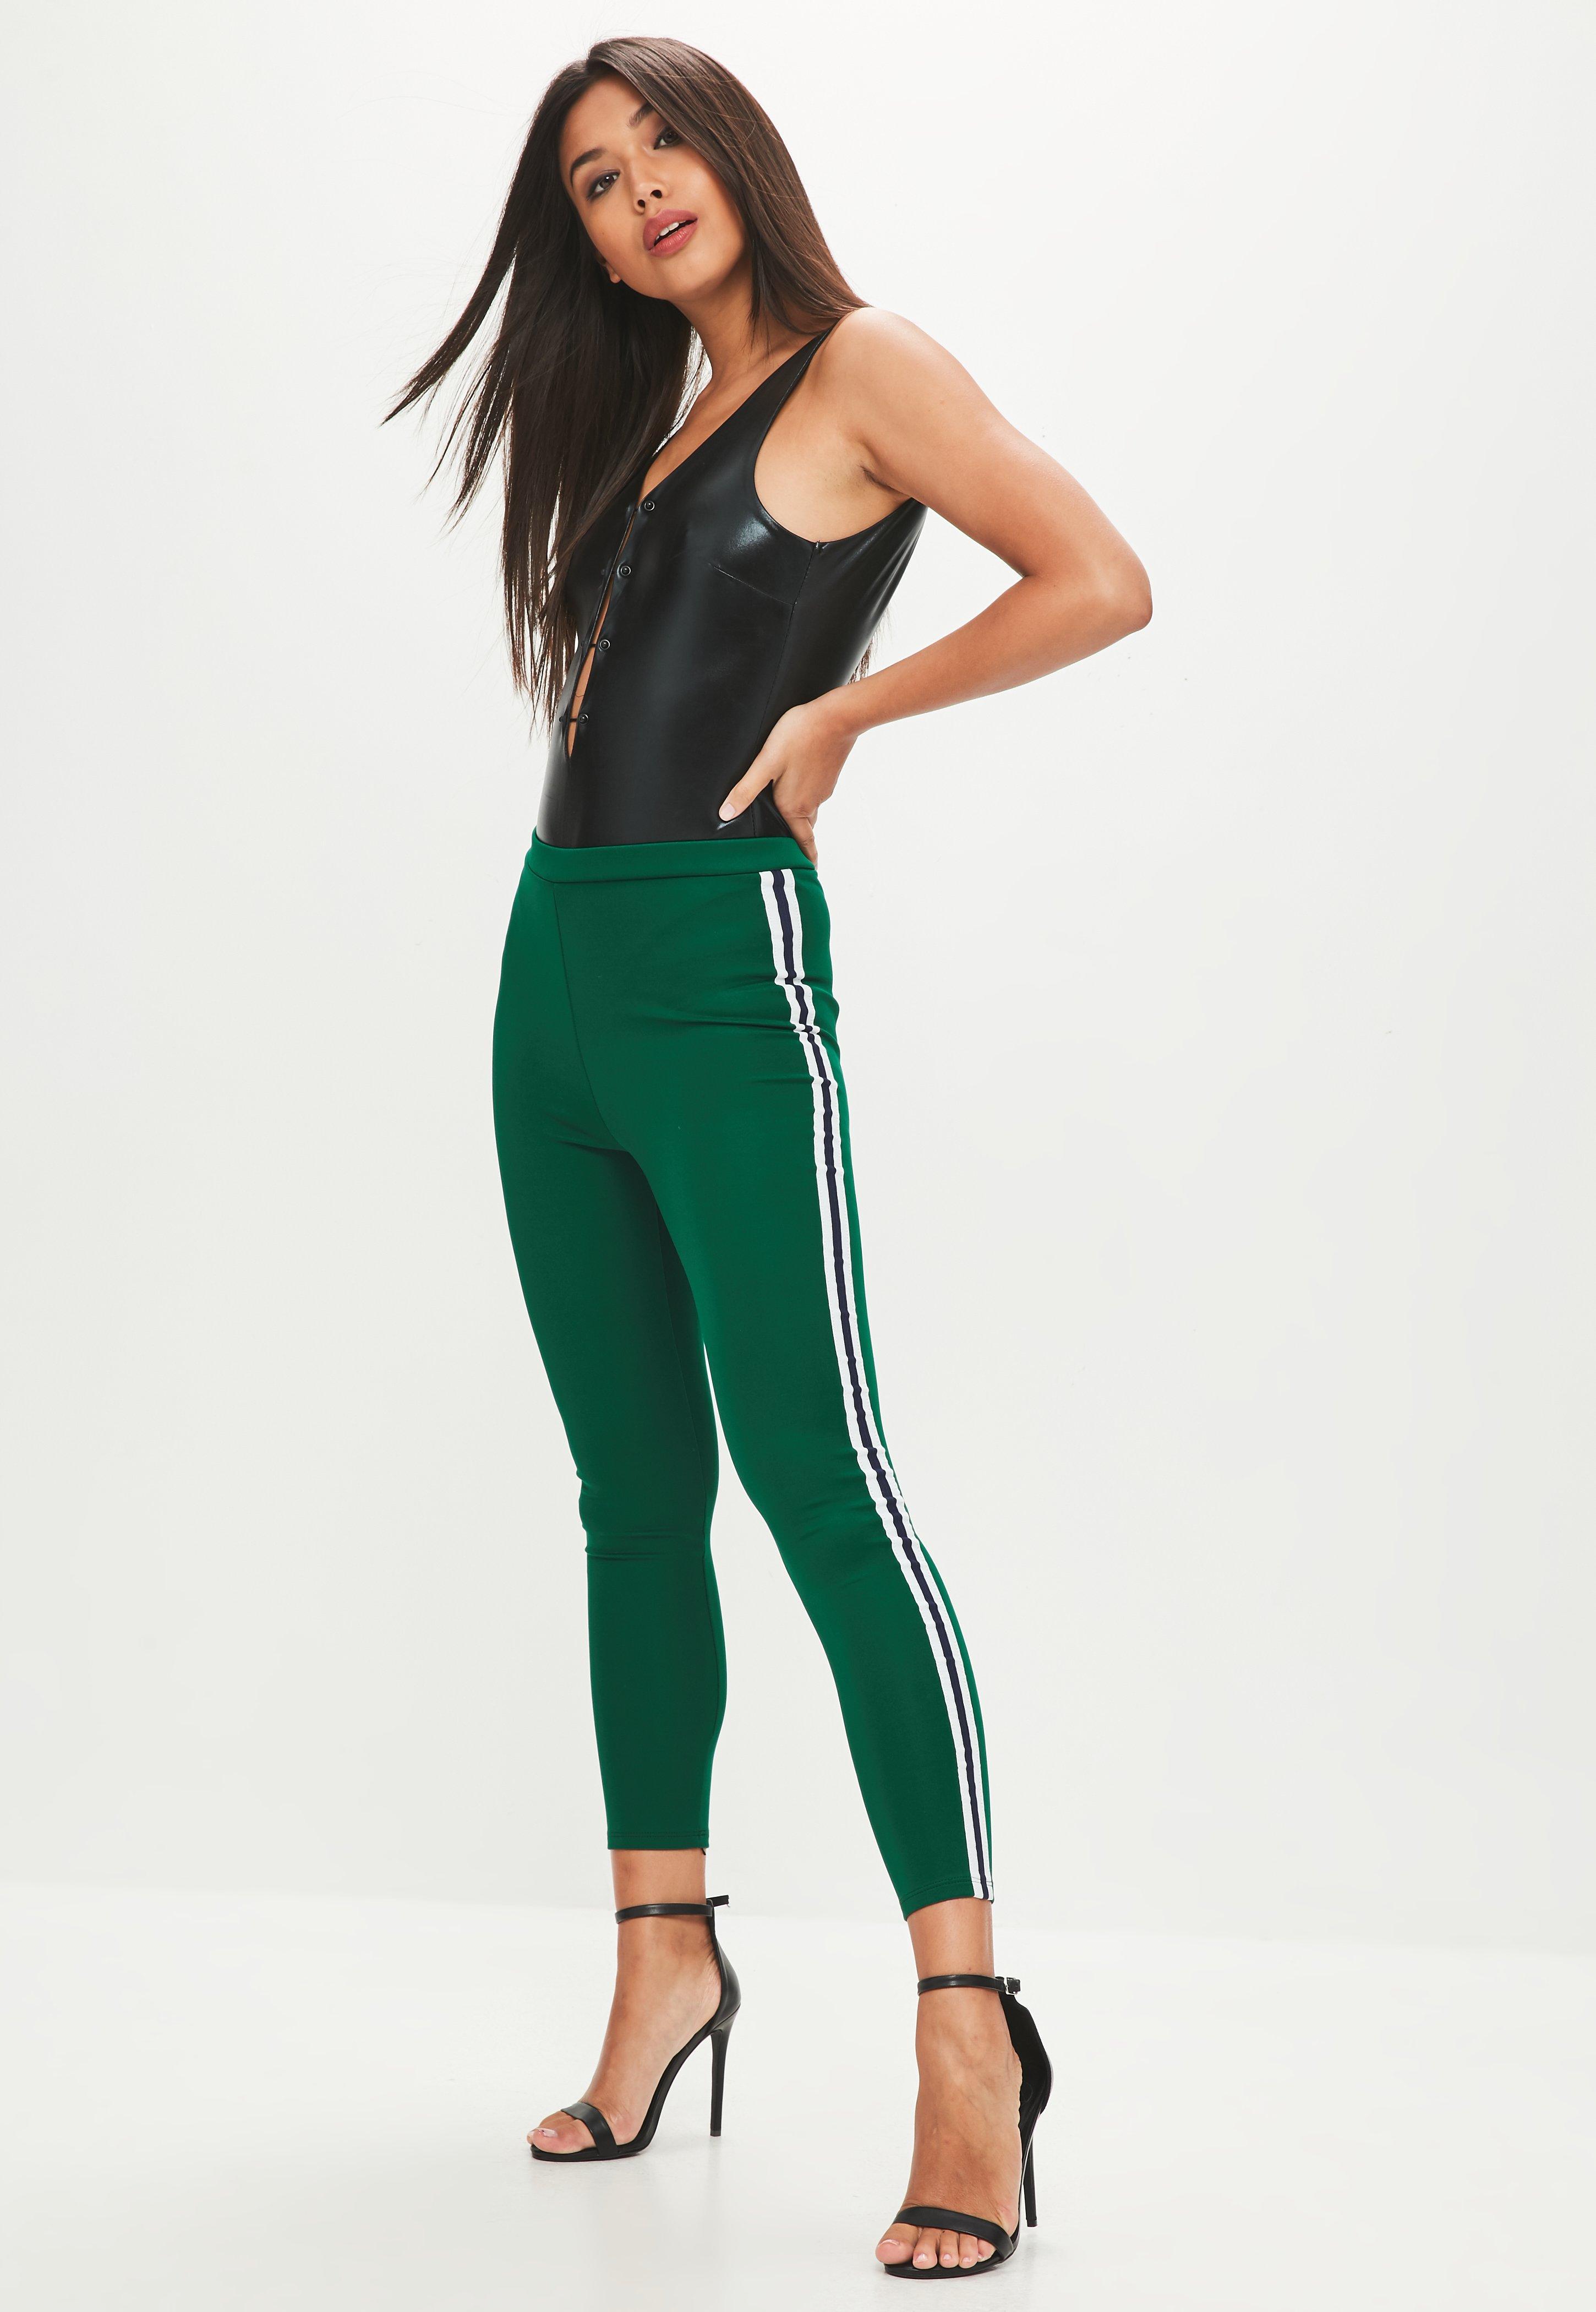 Buy Cheap Original Discount 100% Guaranteed Missguided Double stripe leggings ApdrskGg9g